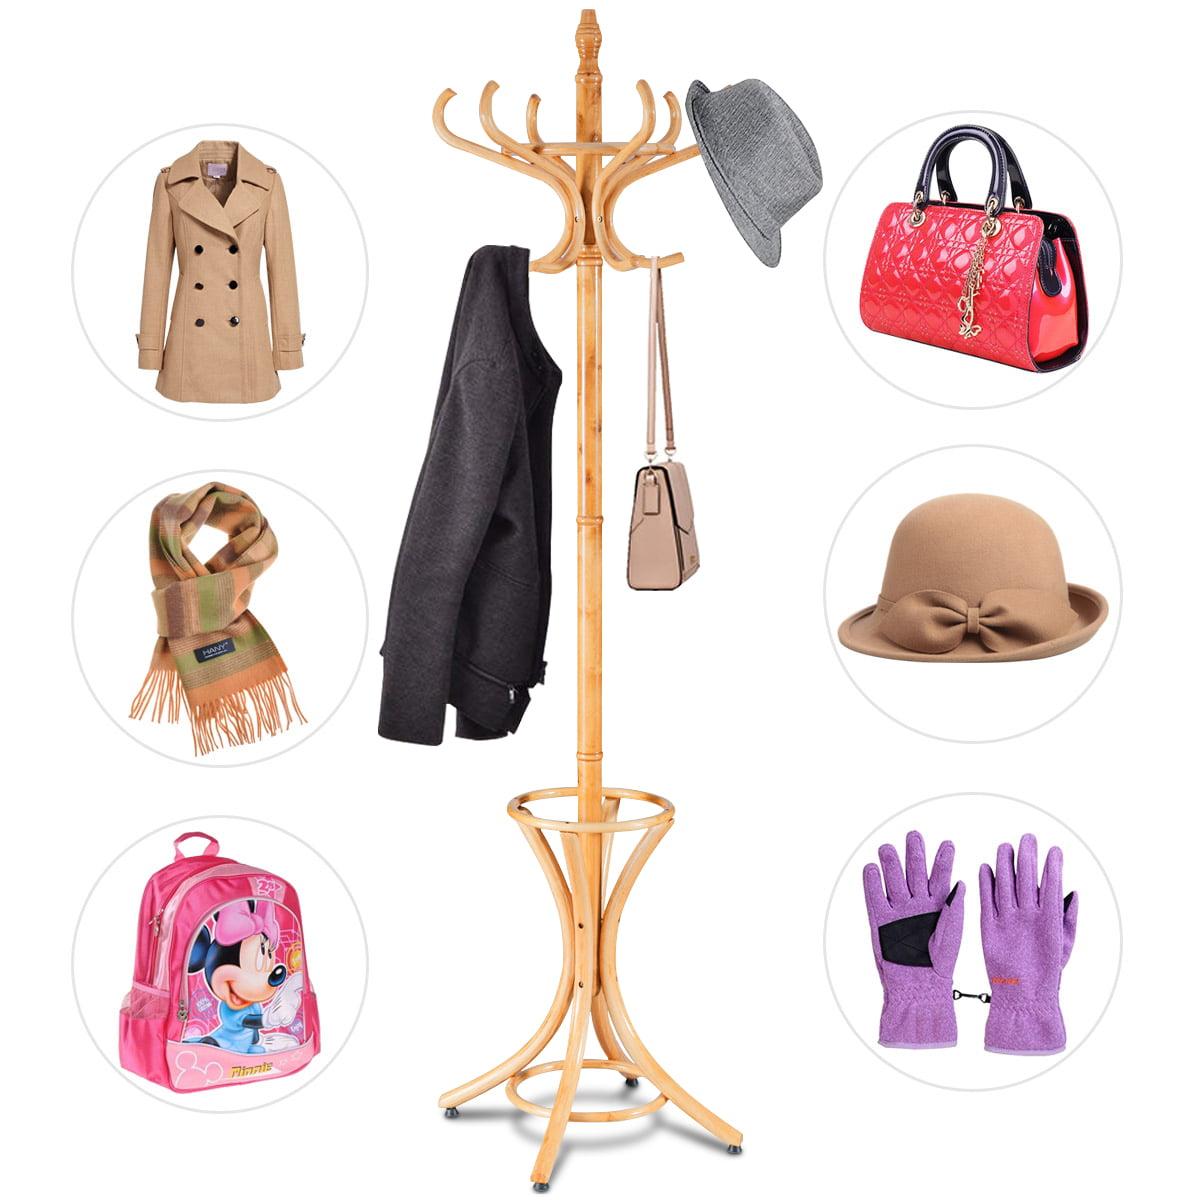 Gymax Wood Standing Hat Coat Rack Jacket Bag Hanger Tree 12 Hooks